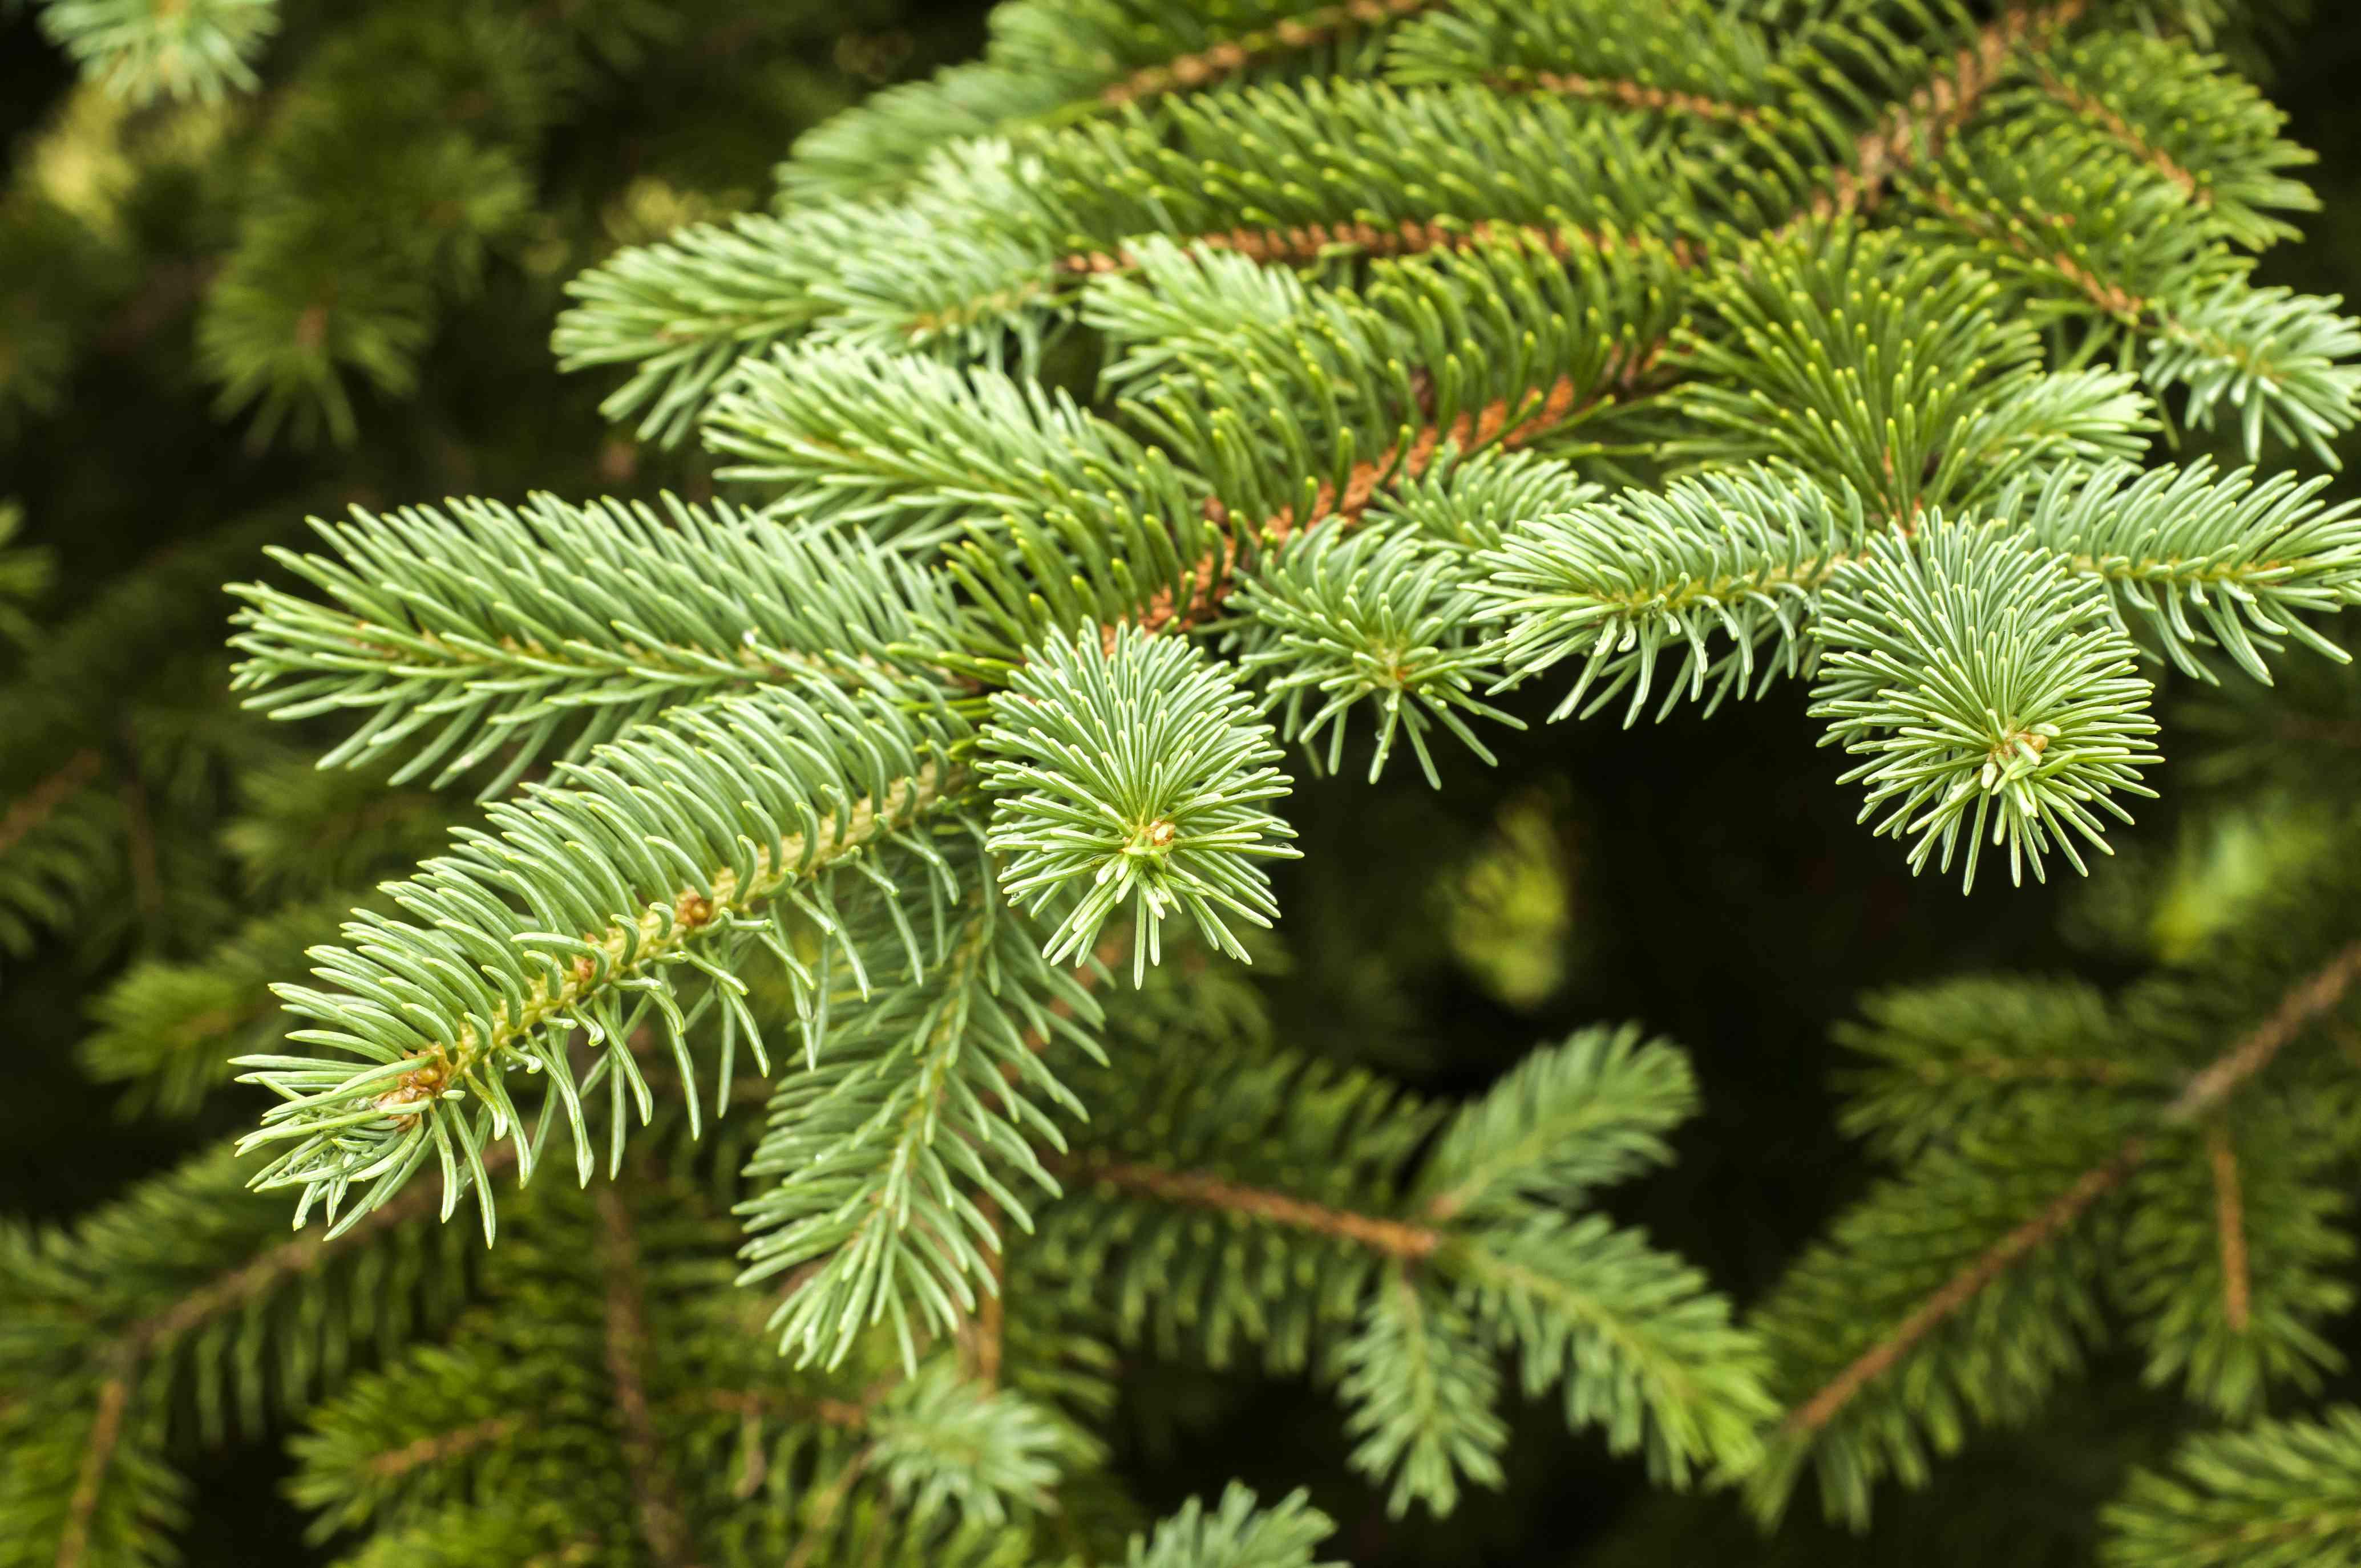 White spruce branch